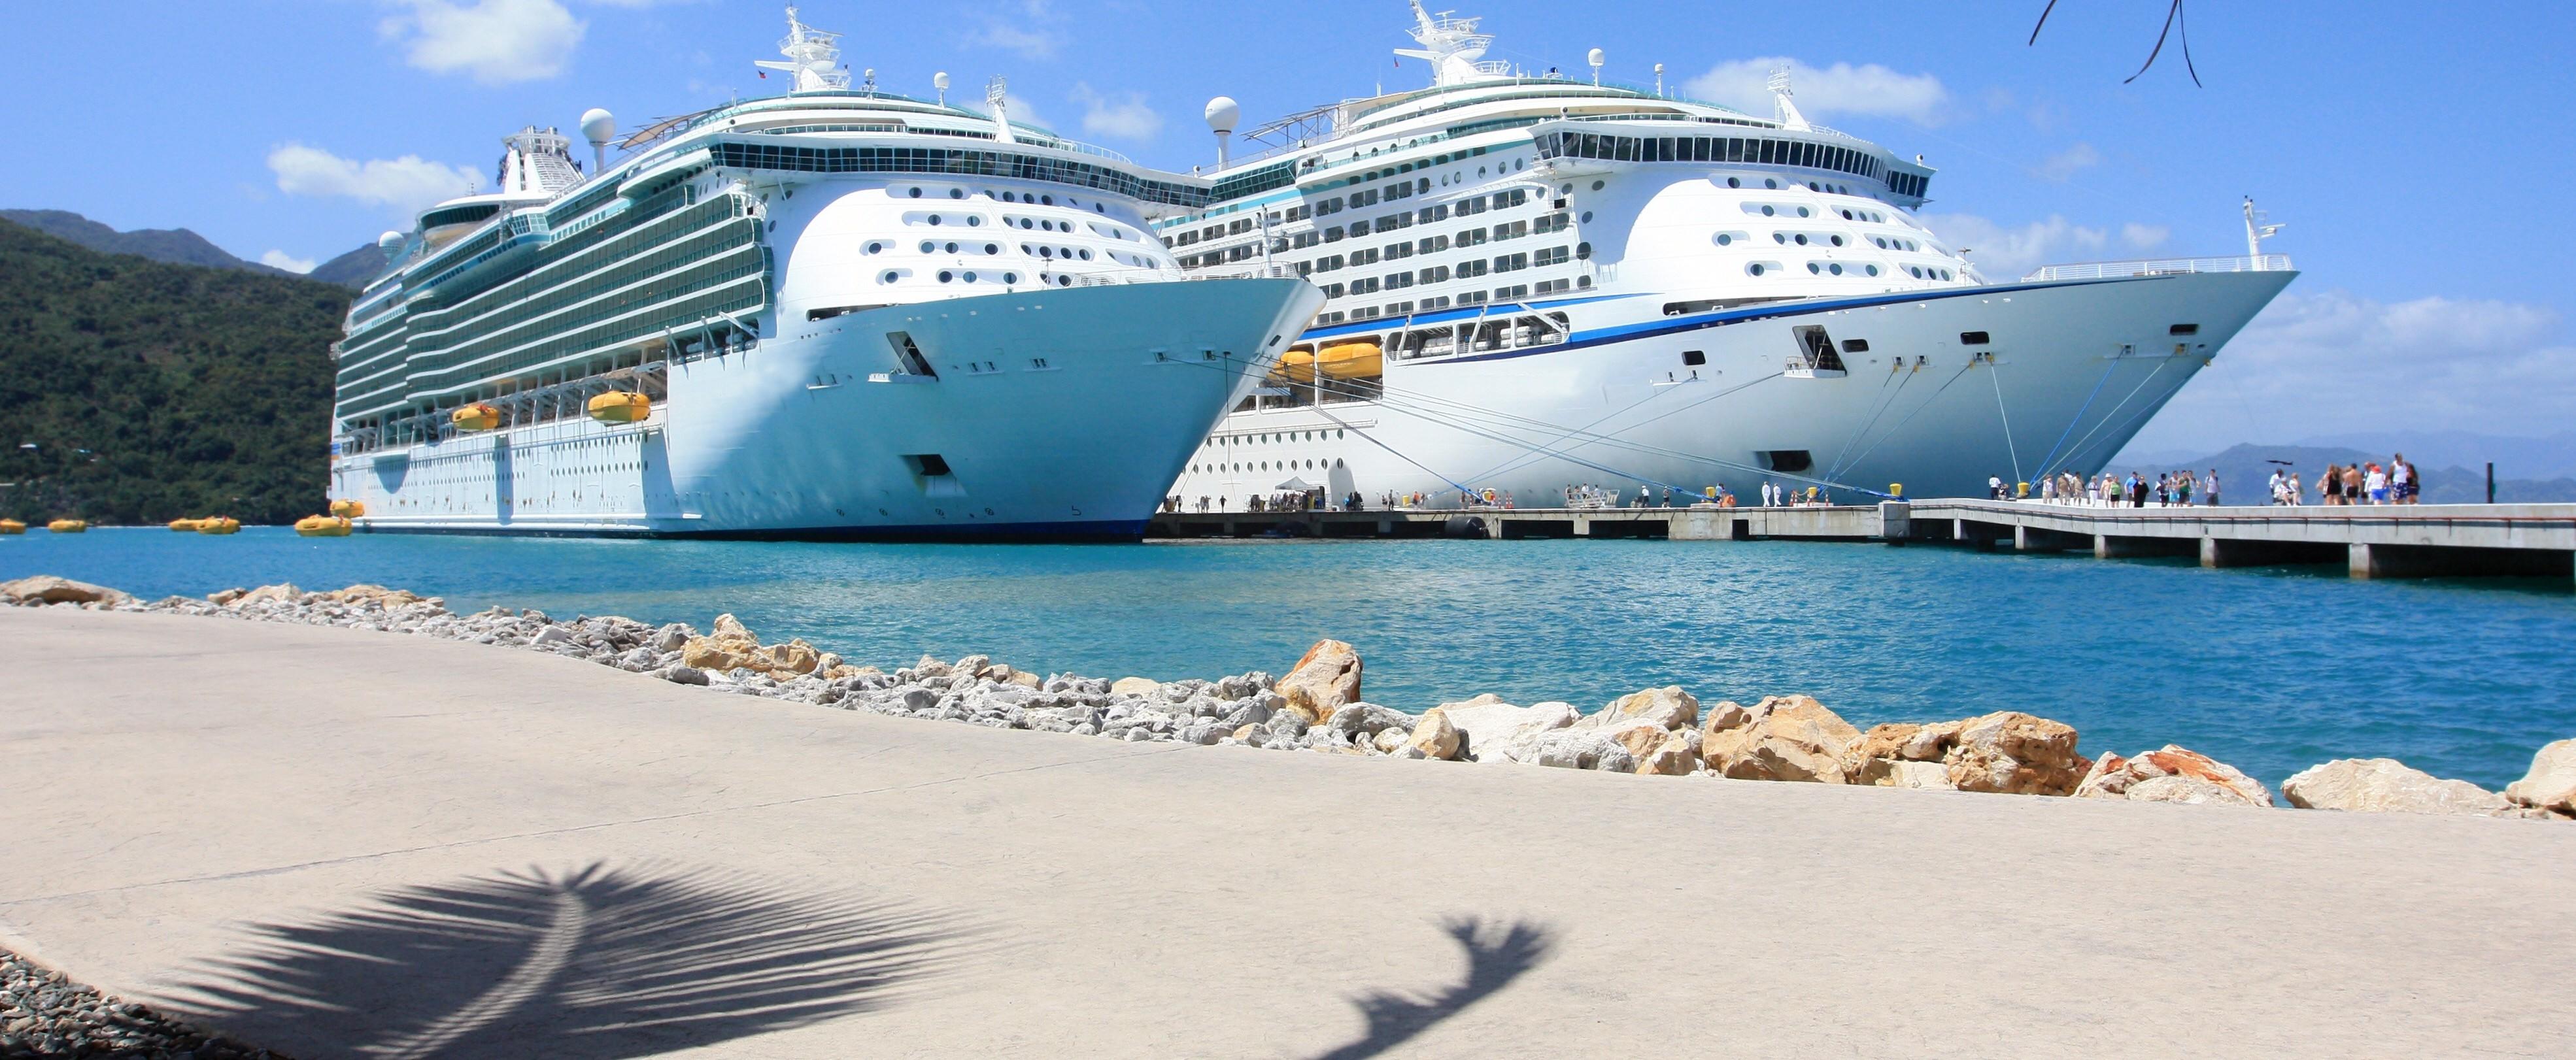 Southampton Cruise Transfer